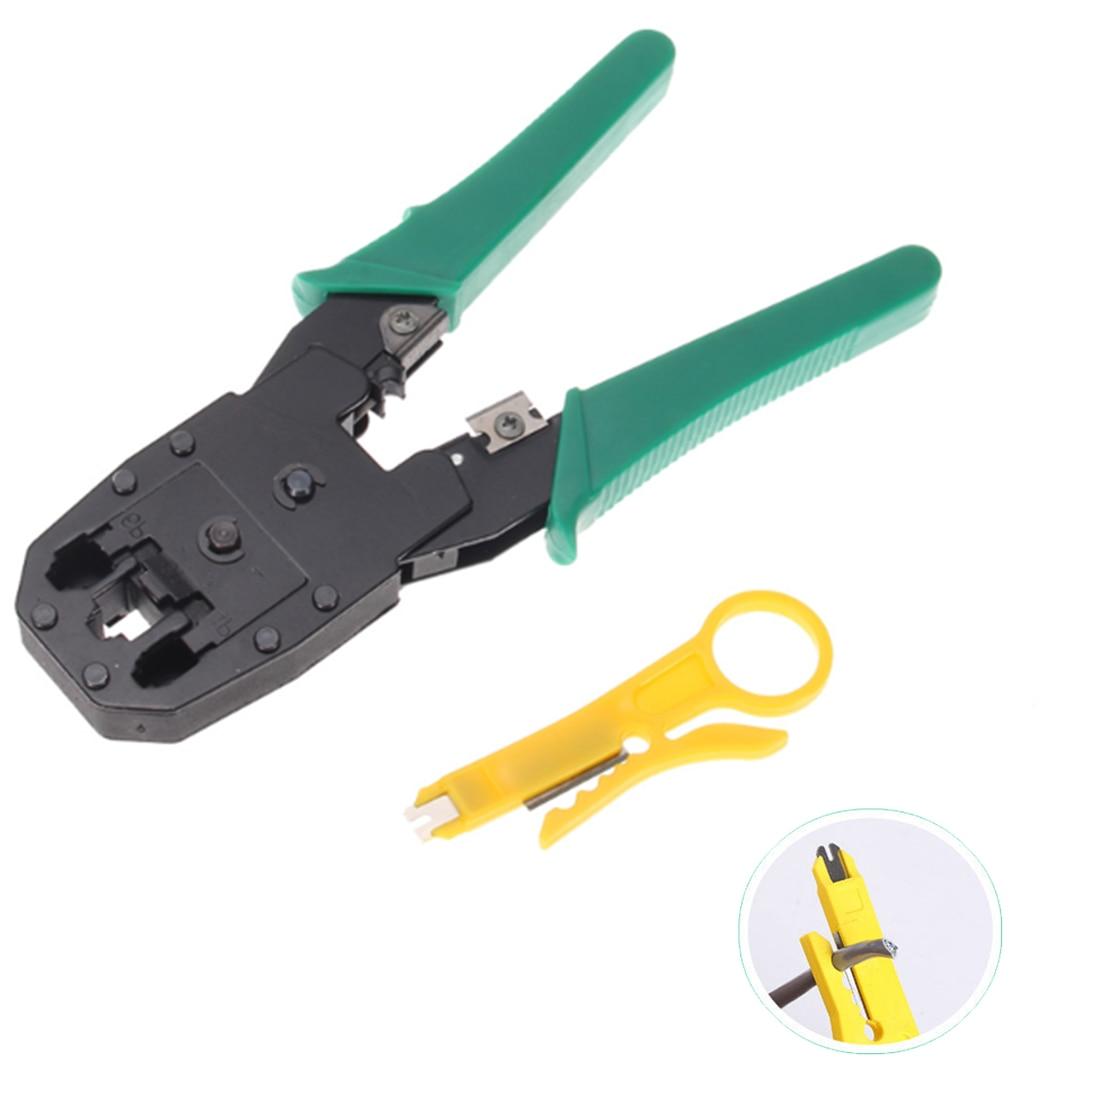 Networking RJ45 RJ11 Wire Cable Crimper Multi Tool Crimp For PC/ Computer Network/8P8C/6P6C/4P4 Plugs Hand Tools